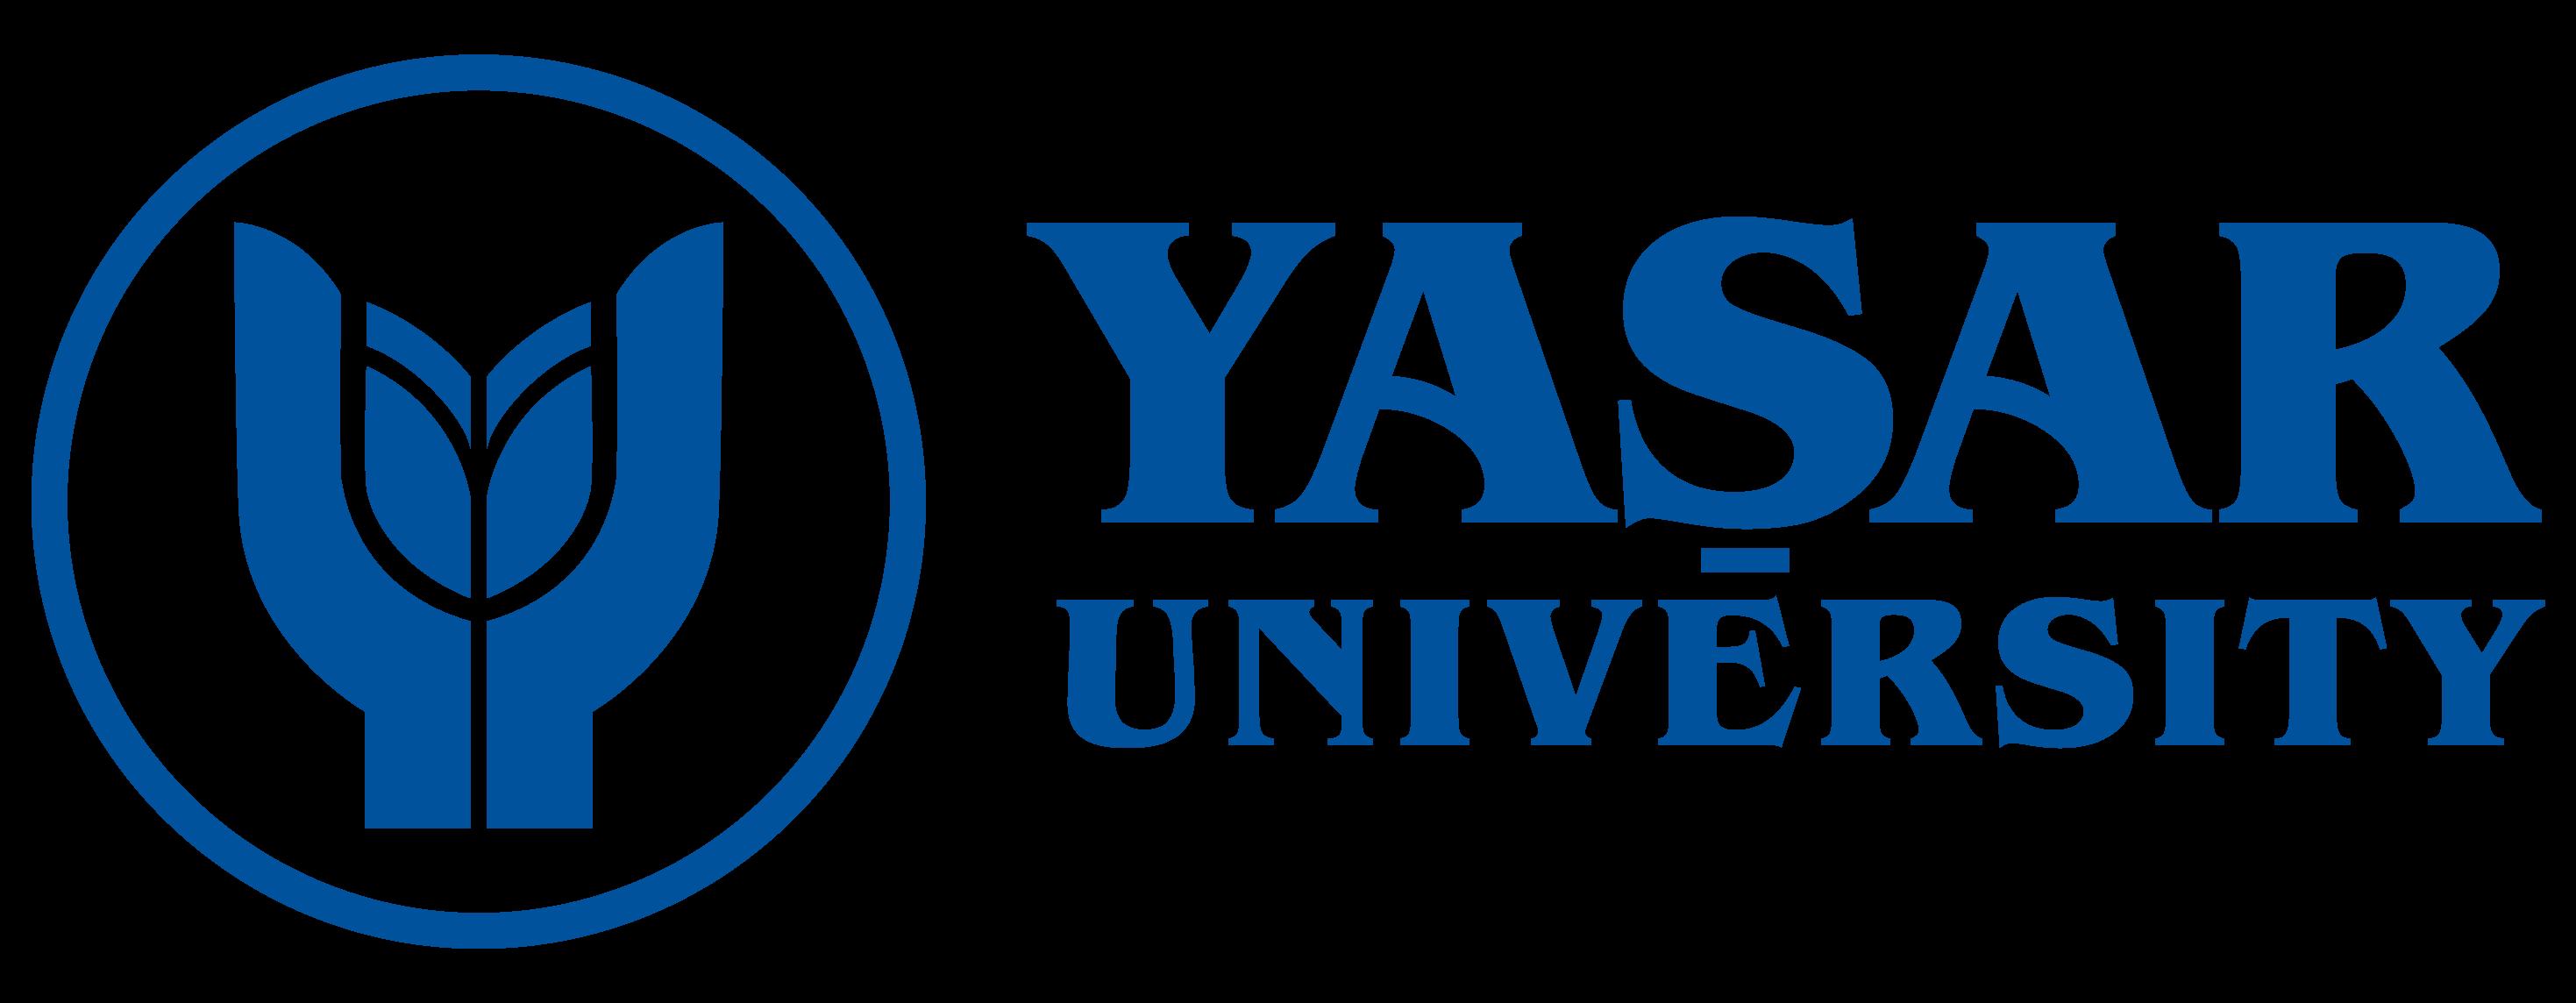 yasar-logo.png